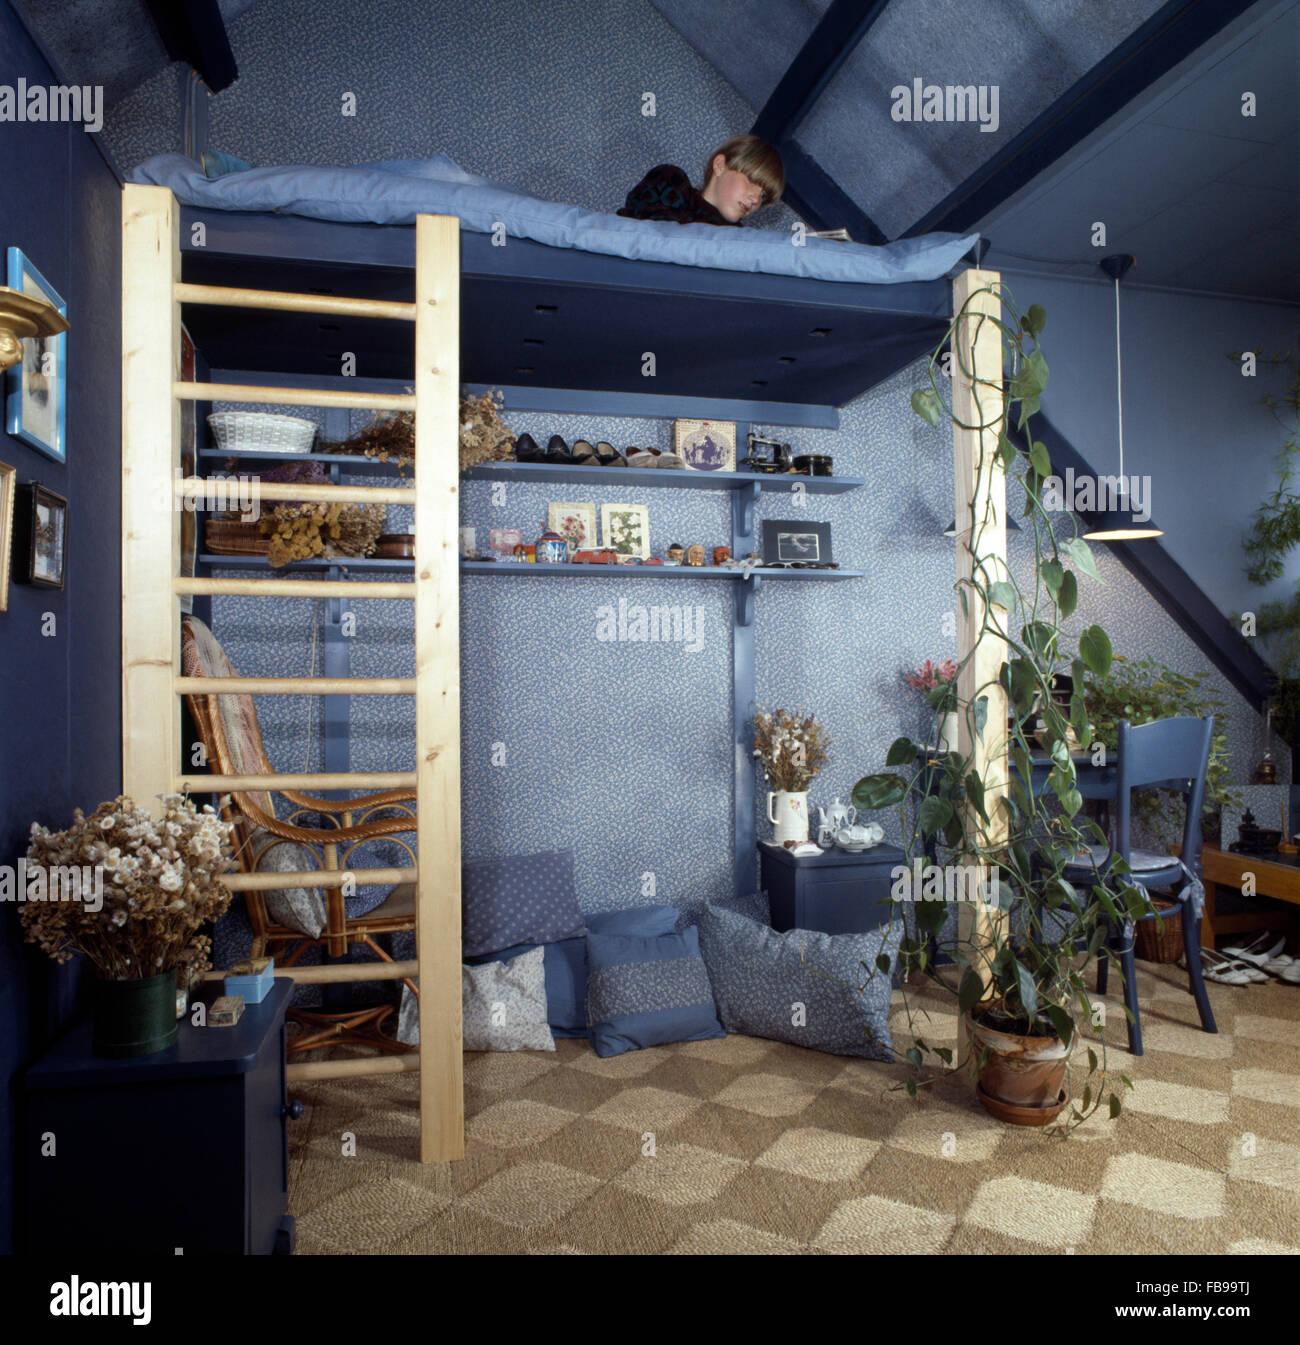 Teenage Boy Lying On Platform Bed In A Blue Seventies Attic Bedroom Stock Photo Alamy